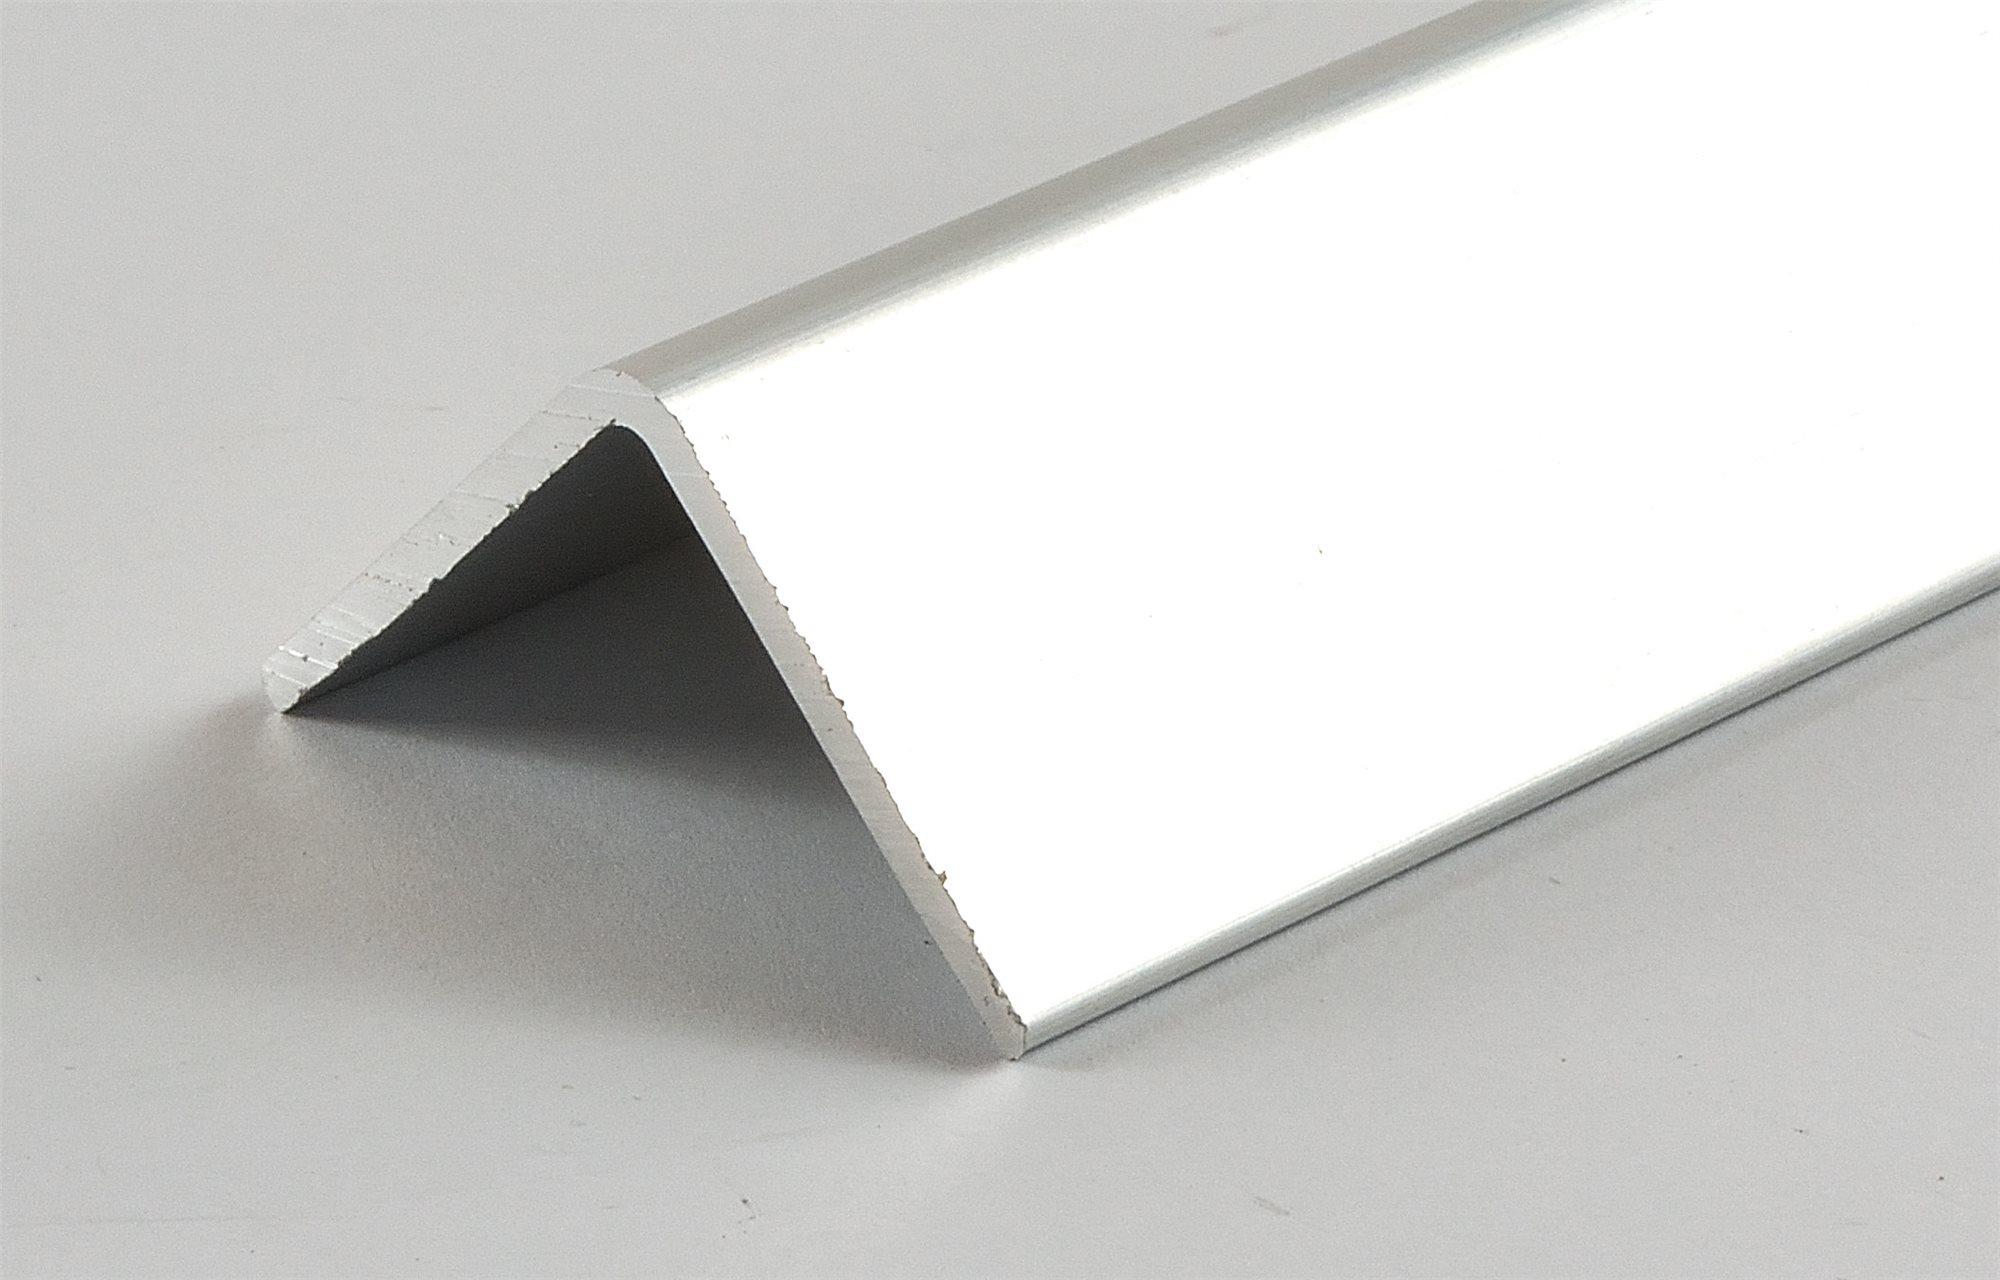 alu kantenschutz 30x30x2 glatt radius 5mm aluminium winkelprofil ebay. Black Bedroom Furniture Sets. Home Design Ideas